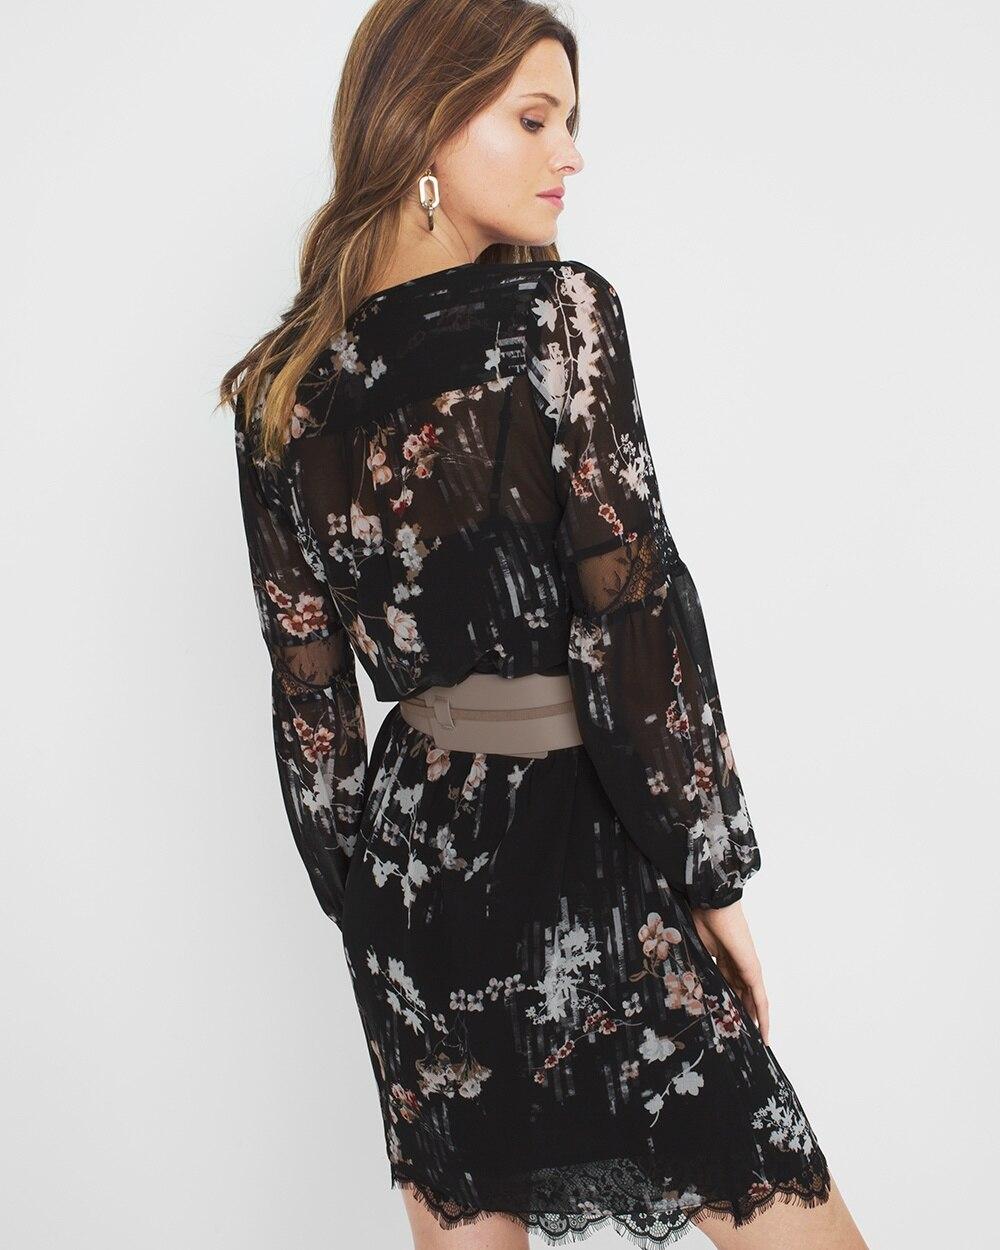 Short Sleeve Floral Maxi Dress